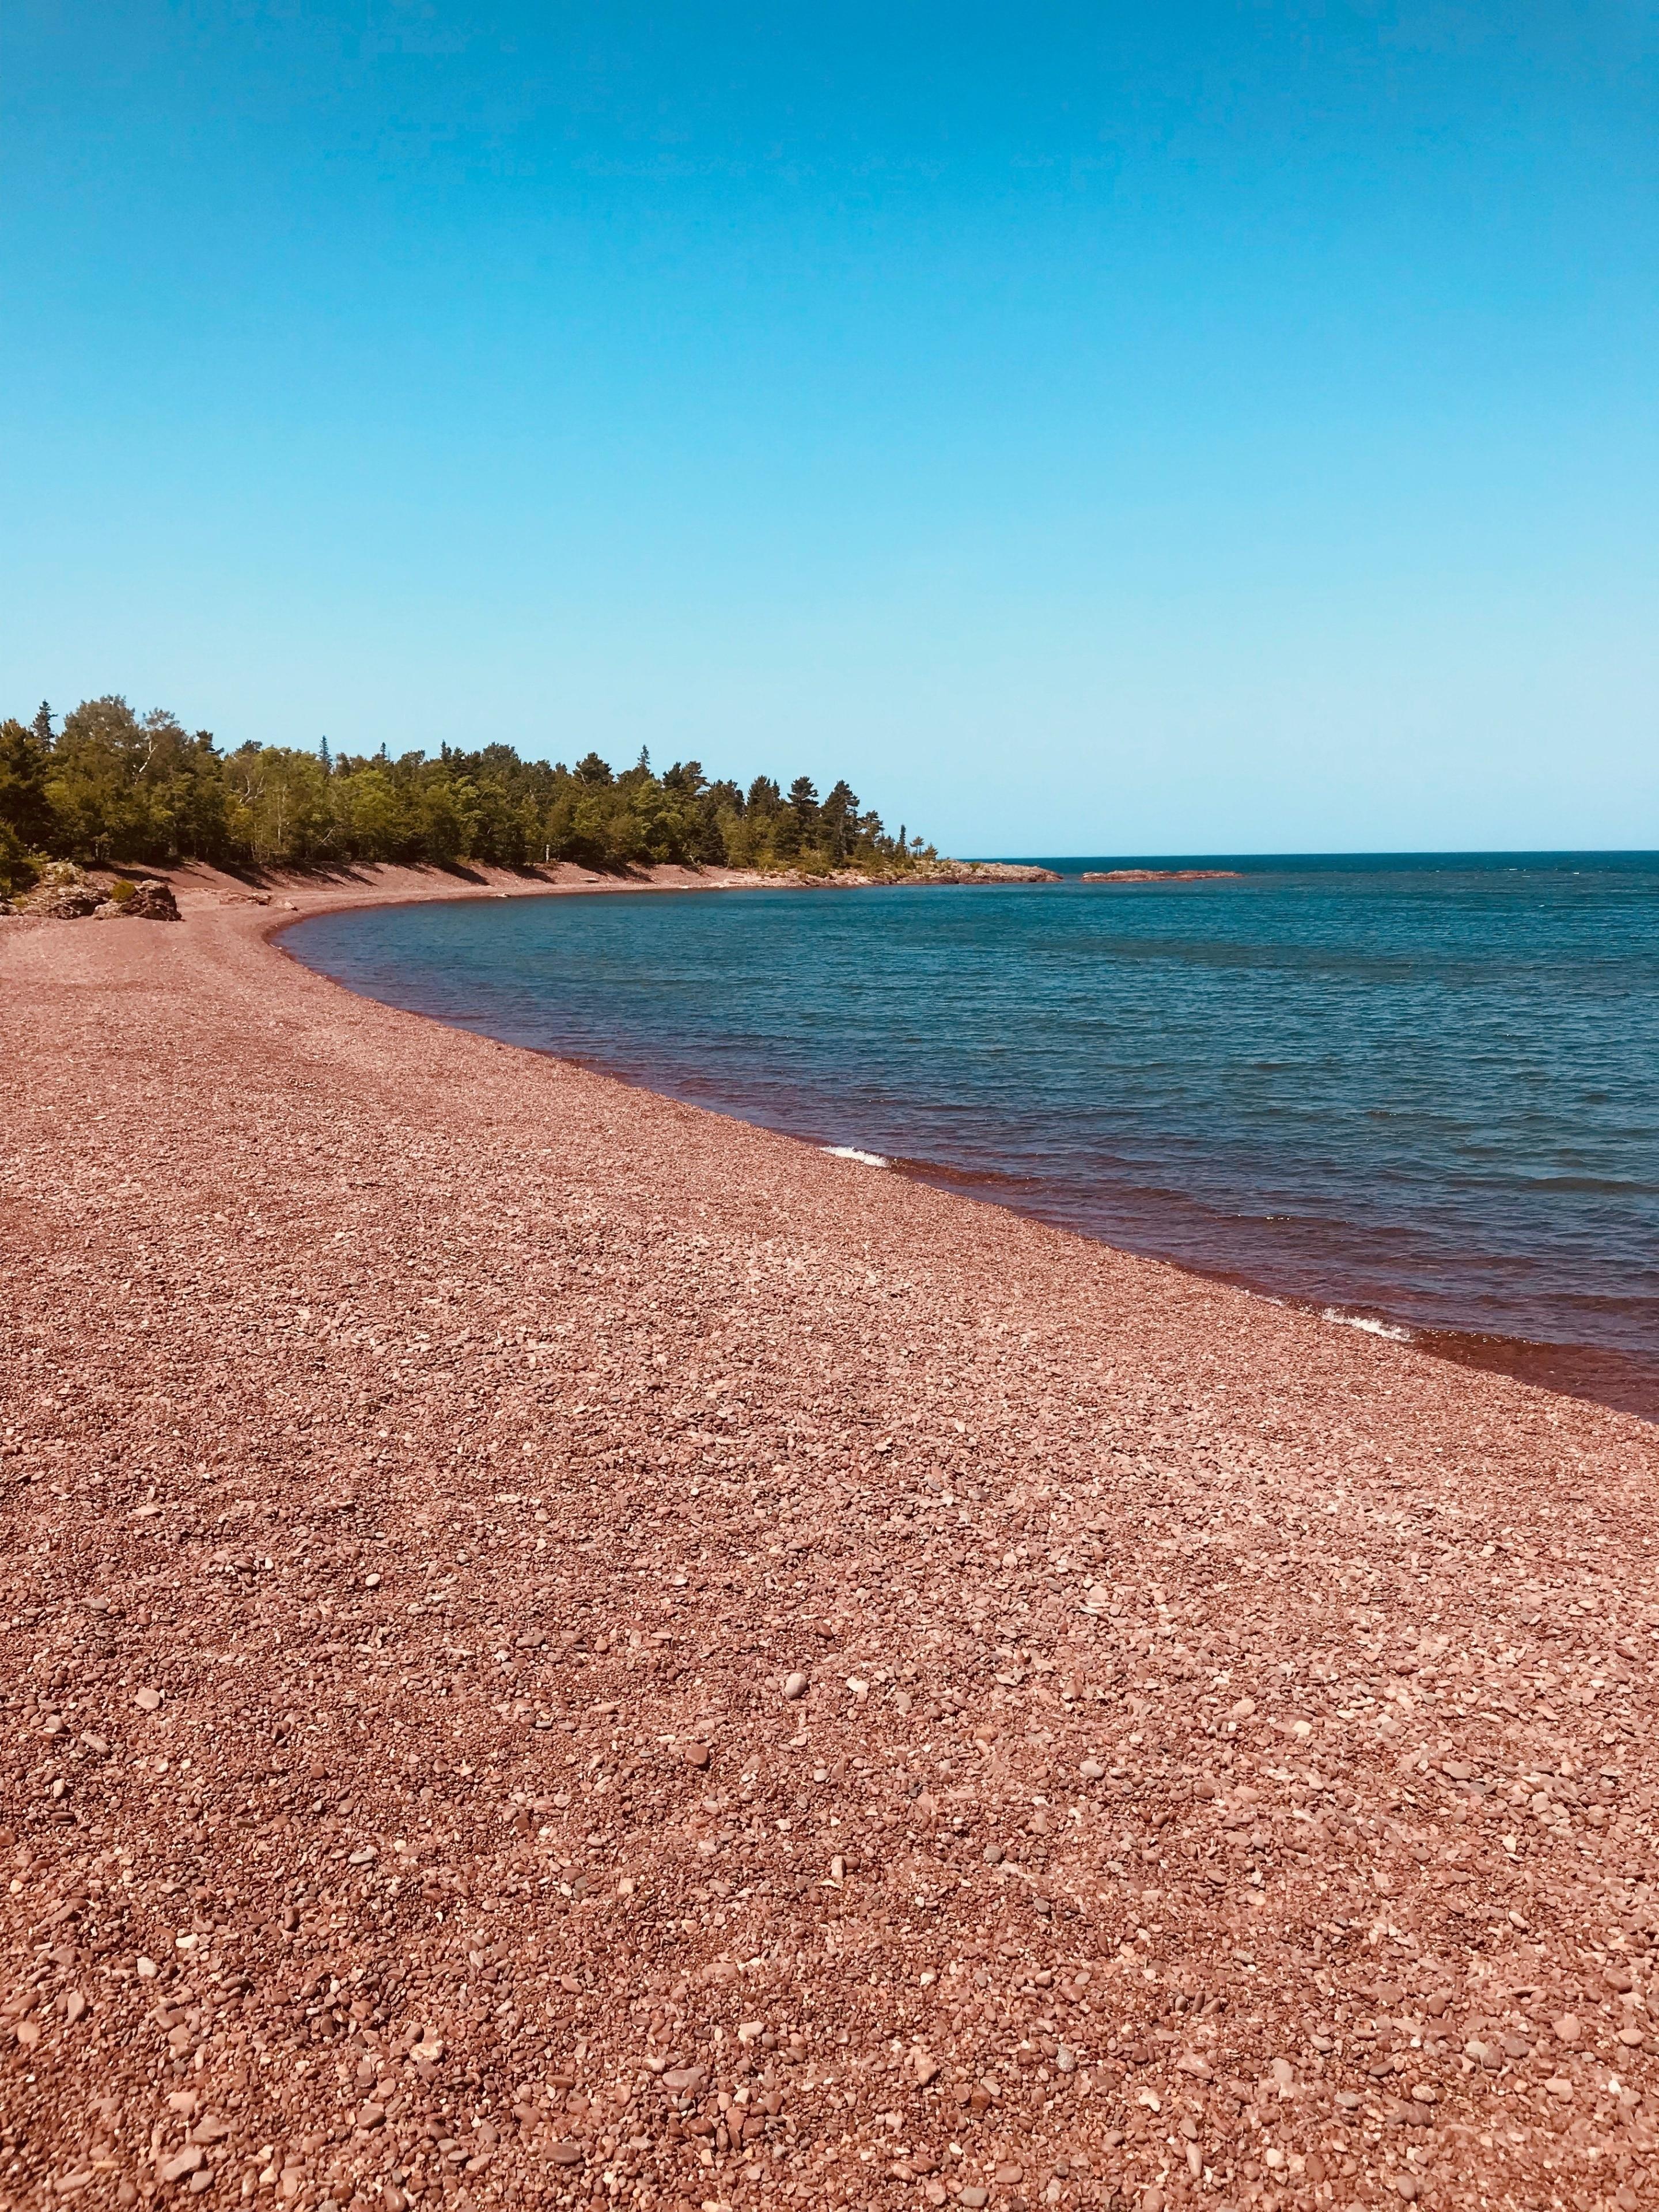 Copper Harbor, Michigan, United States of America